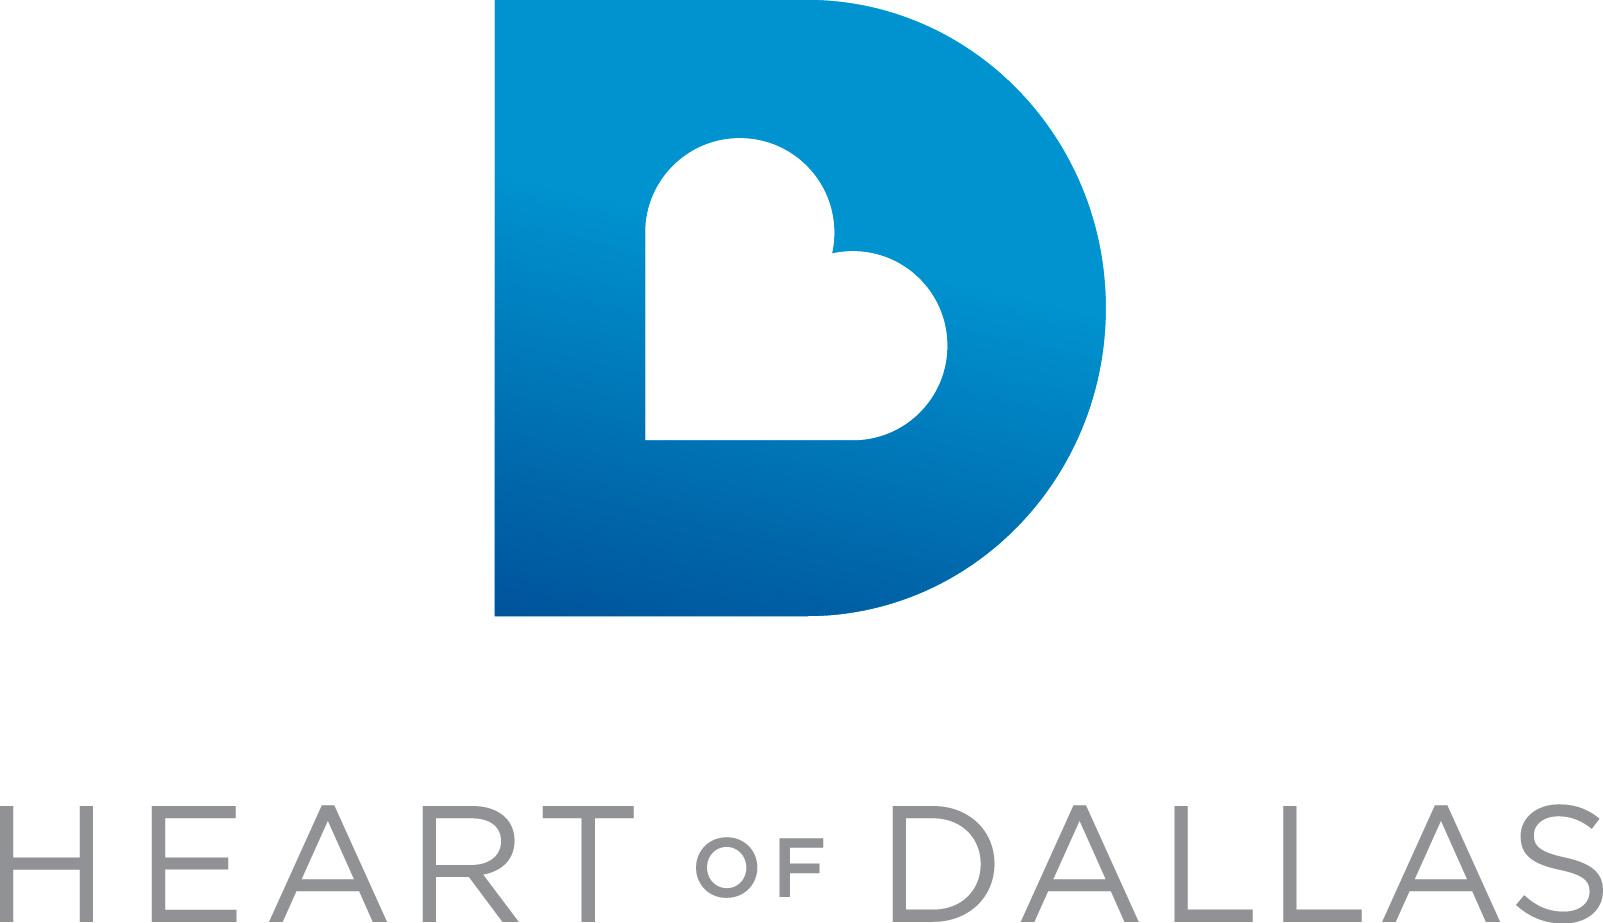 Heart_of_Dallas_logo_PMS_3-color - JPEG.jpg